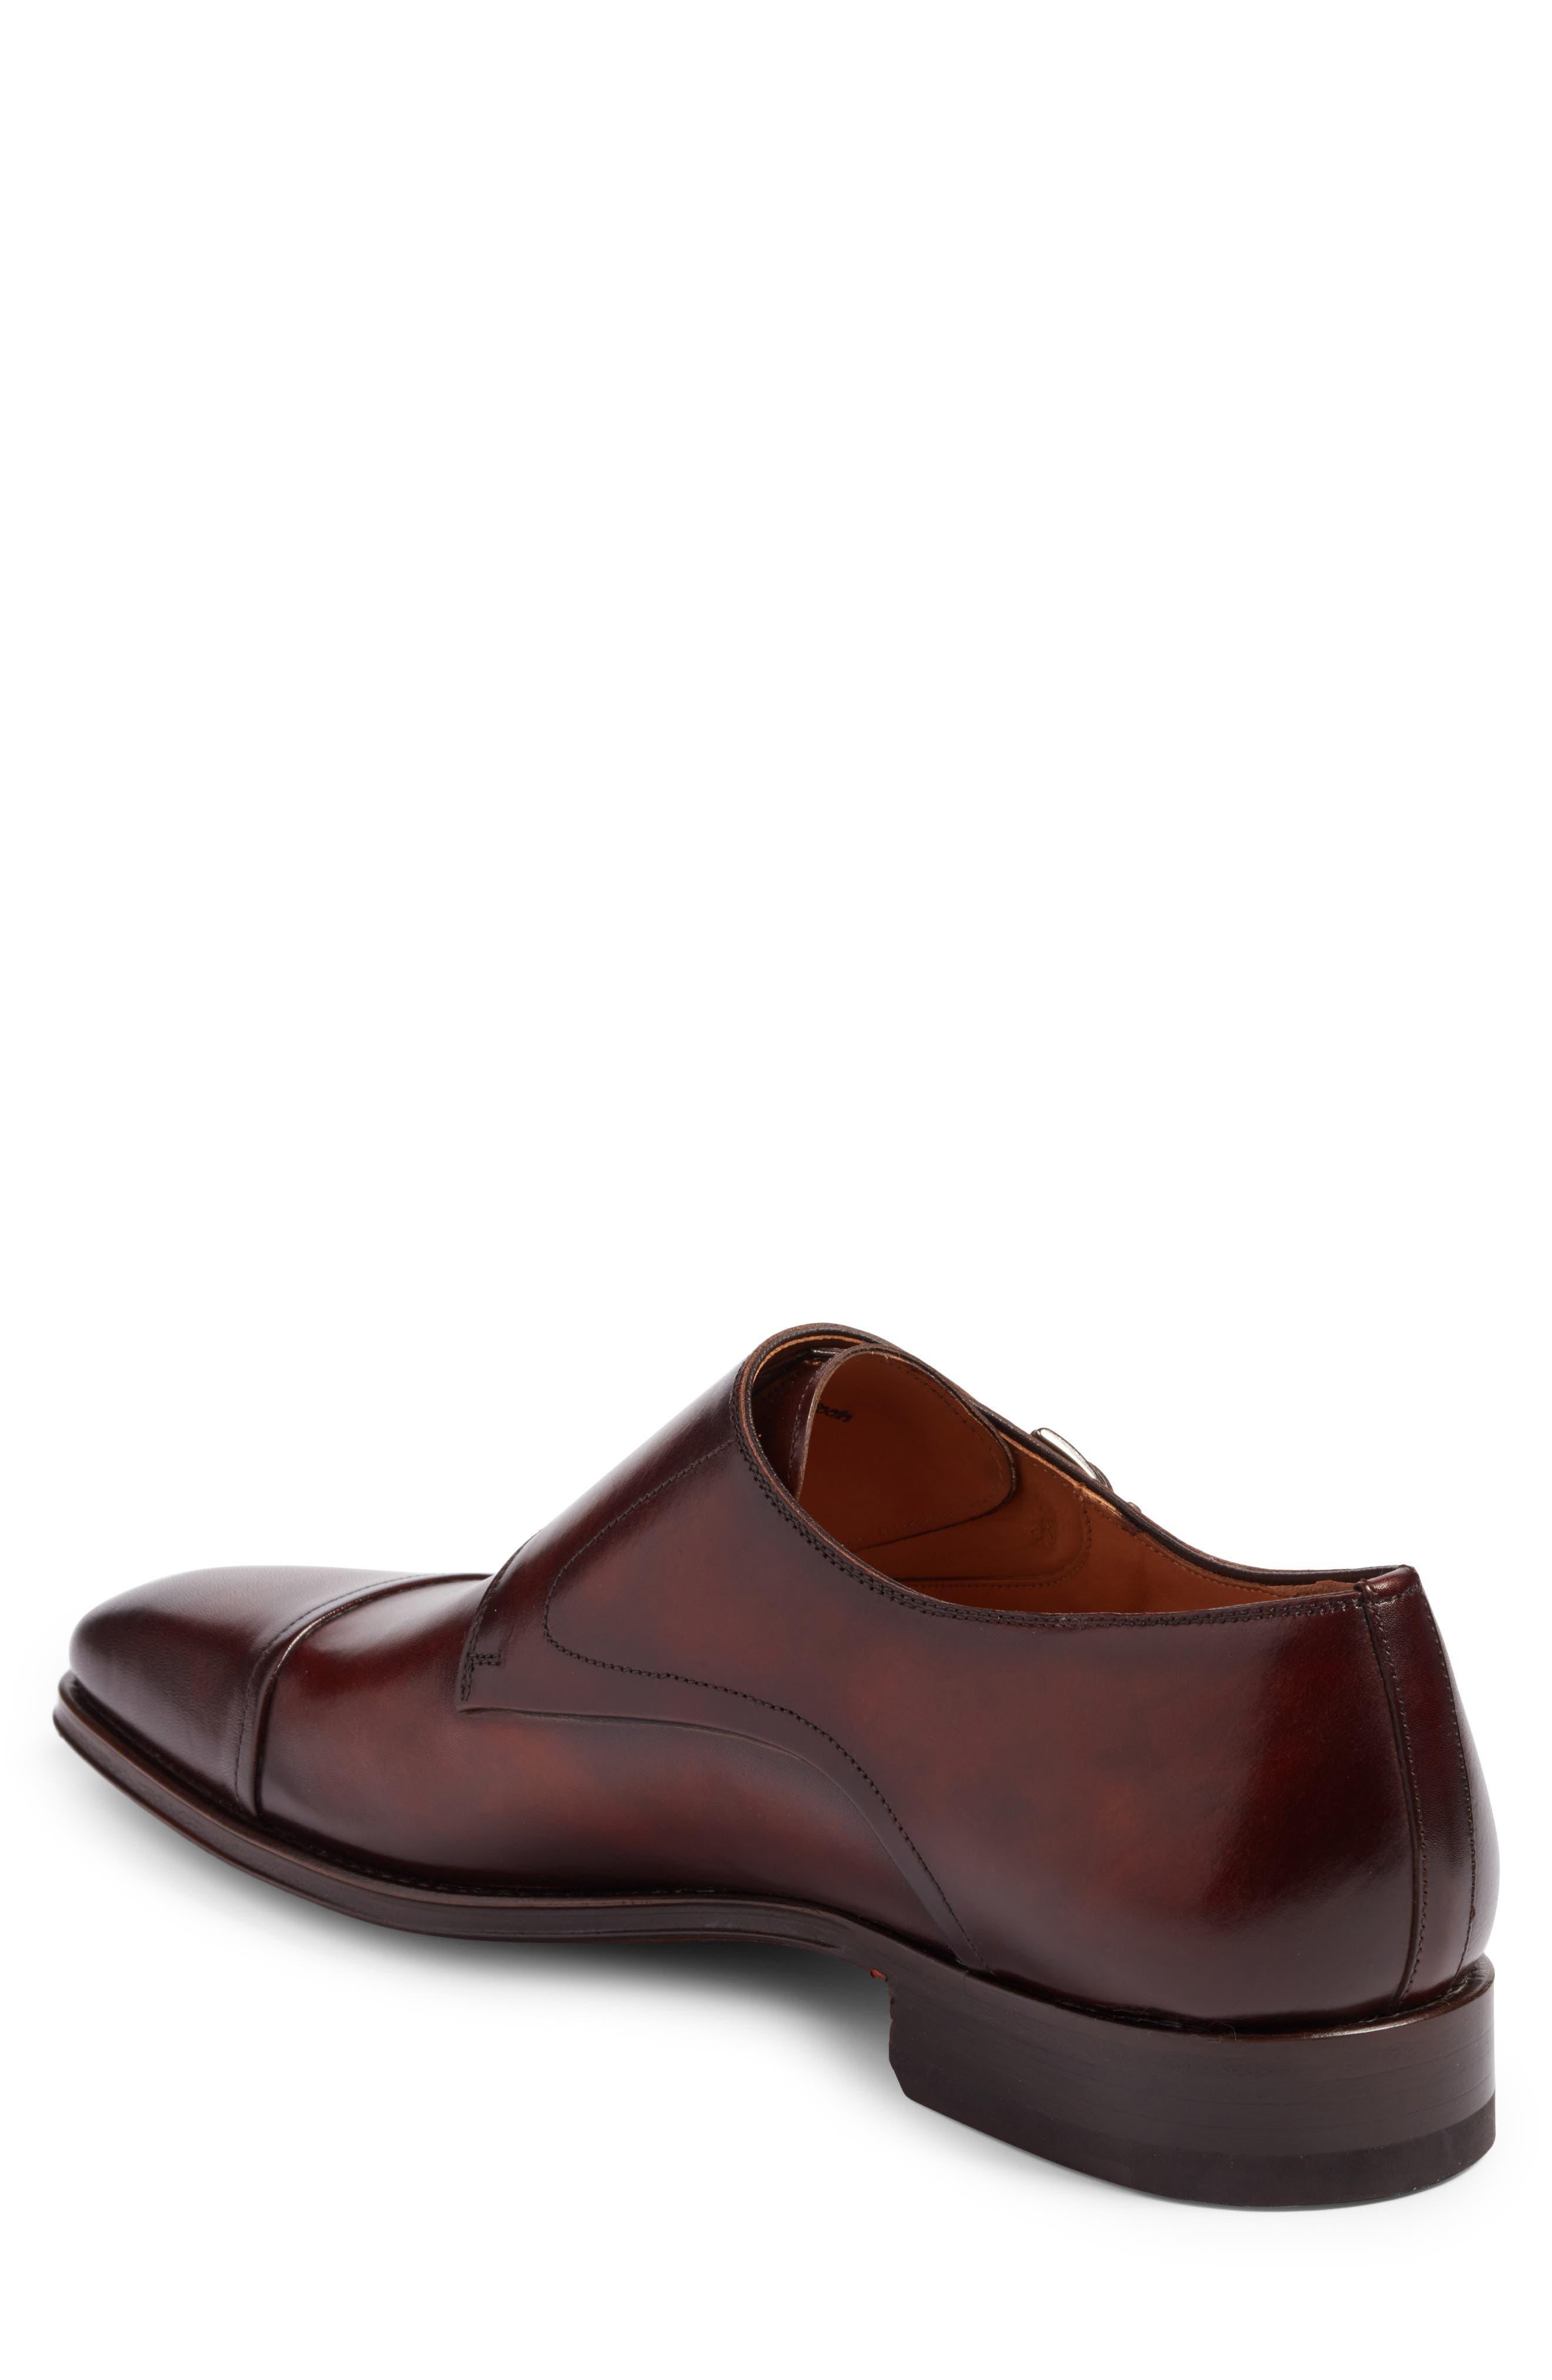 Silvio Double Monk Strap Shoe,                             Alternate thumbnail 2, color,                             TOBACCO LEATHER